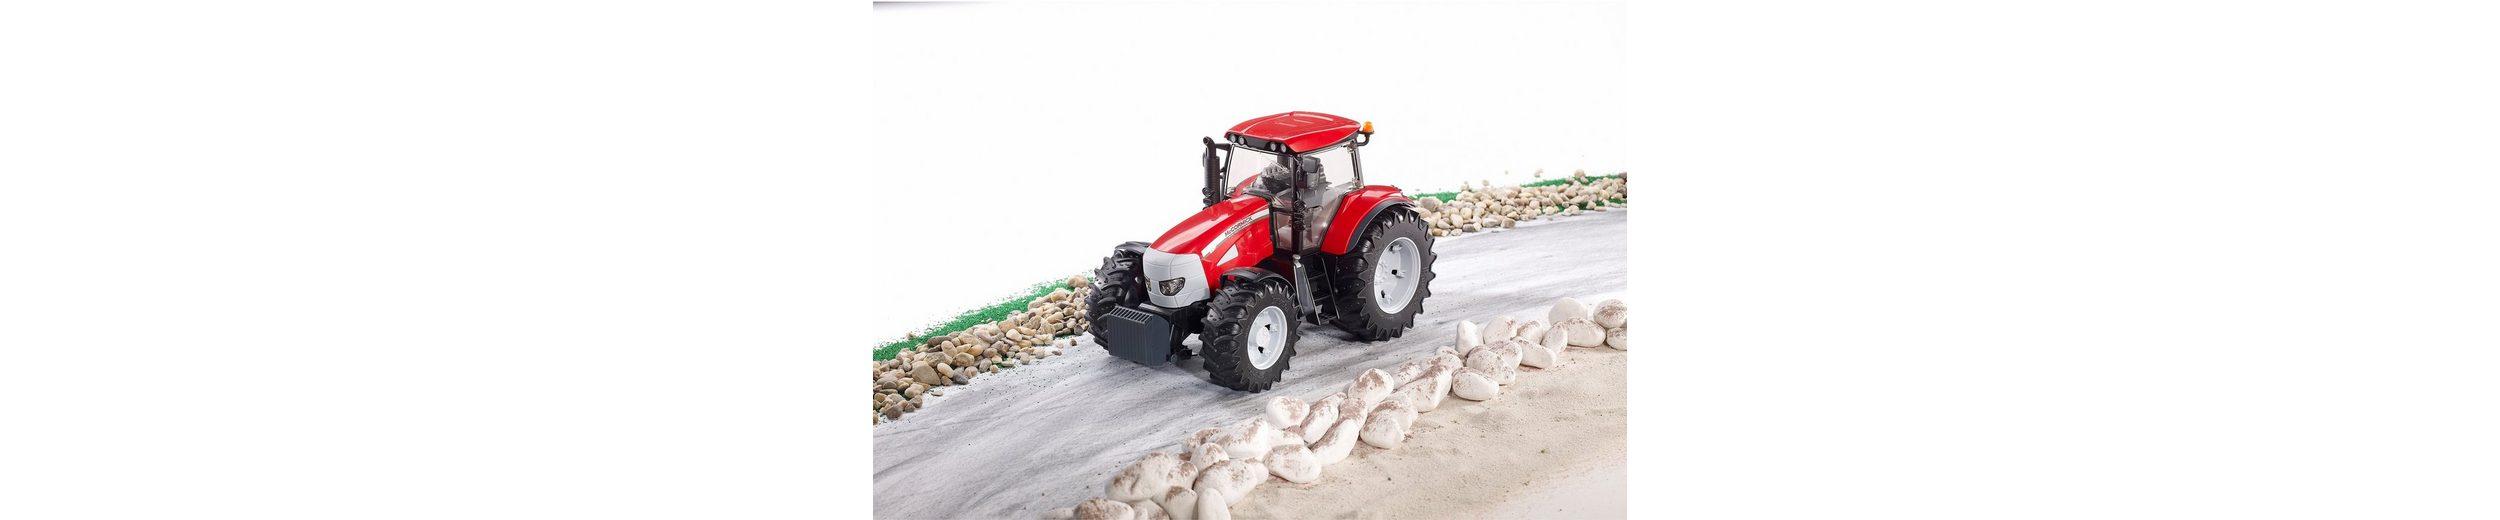 bruder® Traktor, »McCormick XTX165«